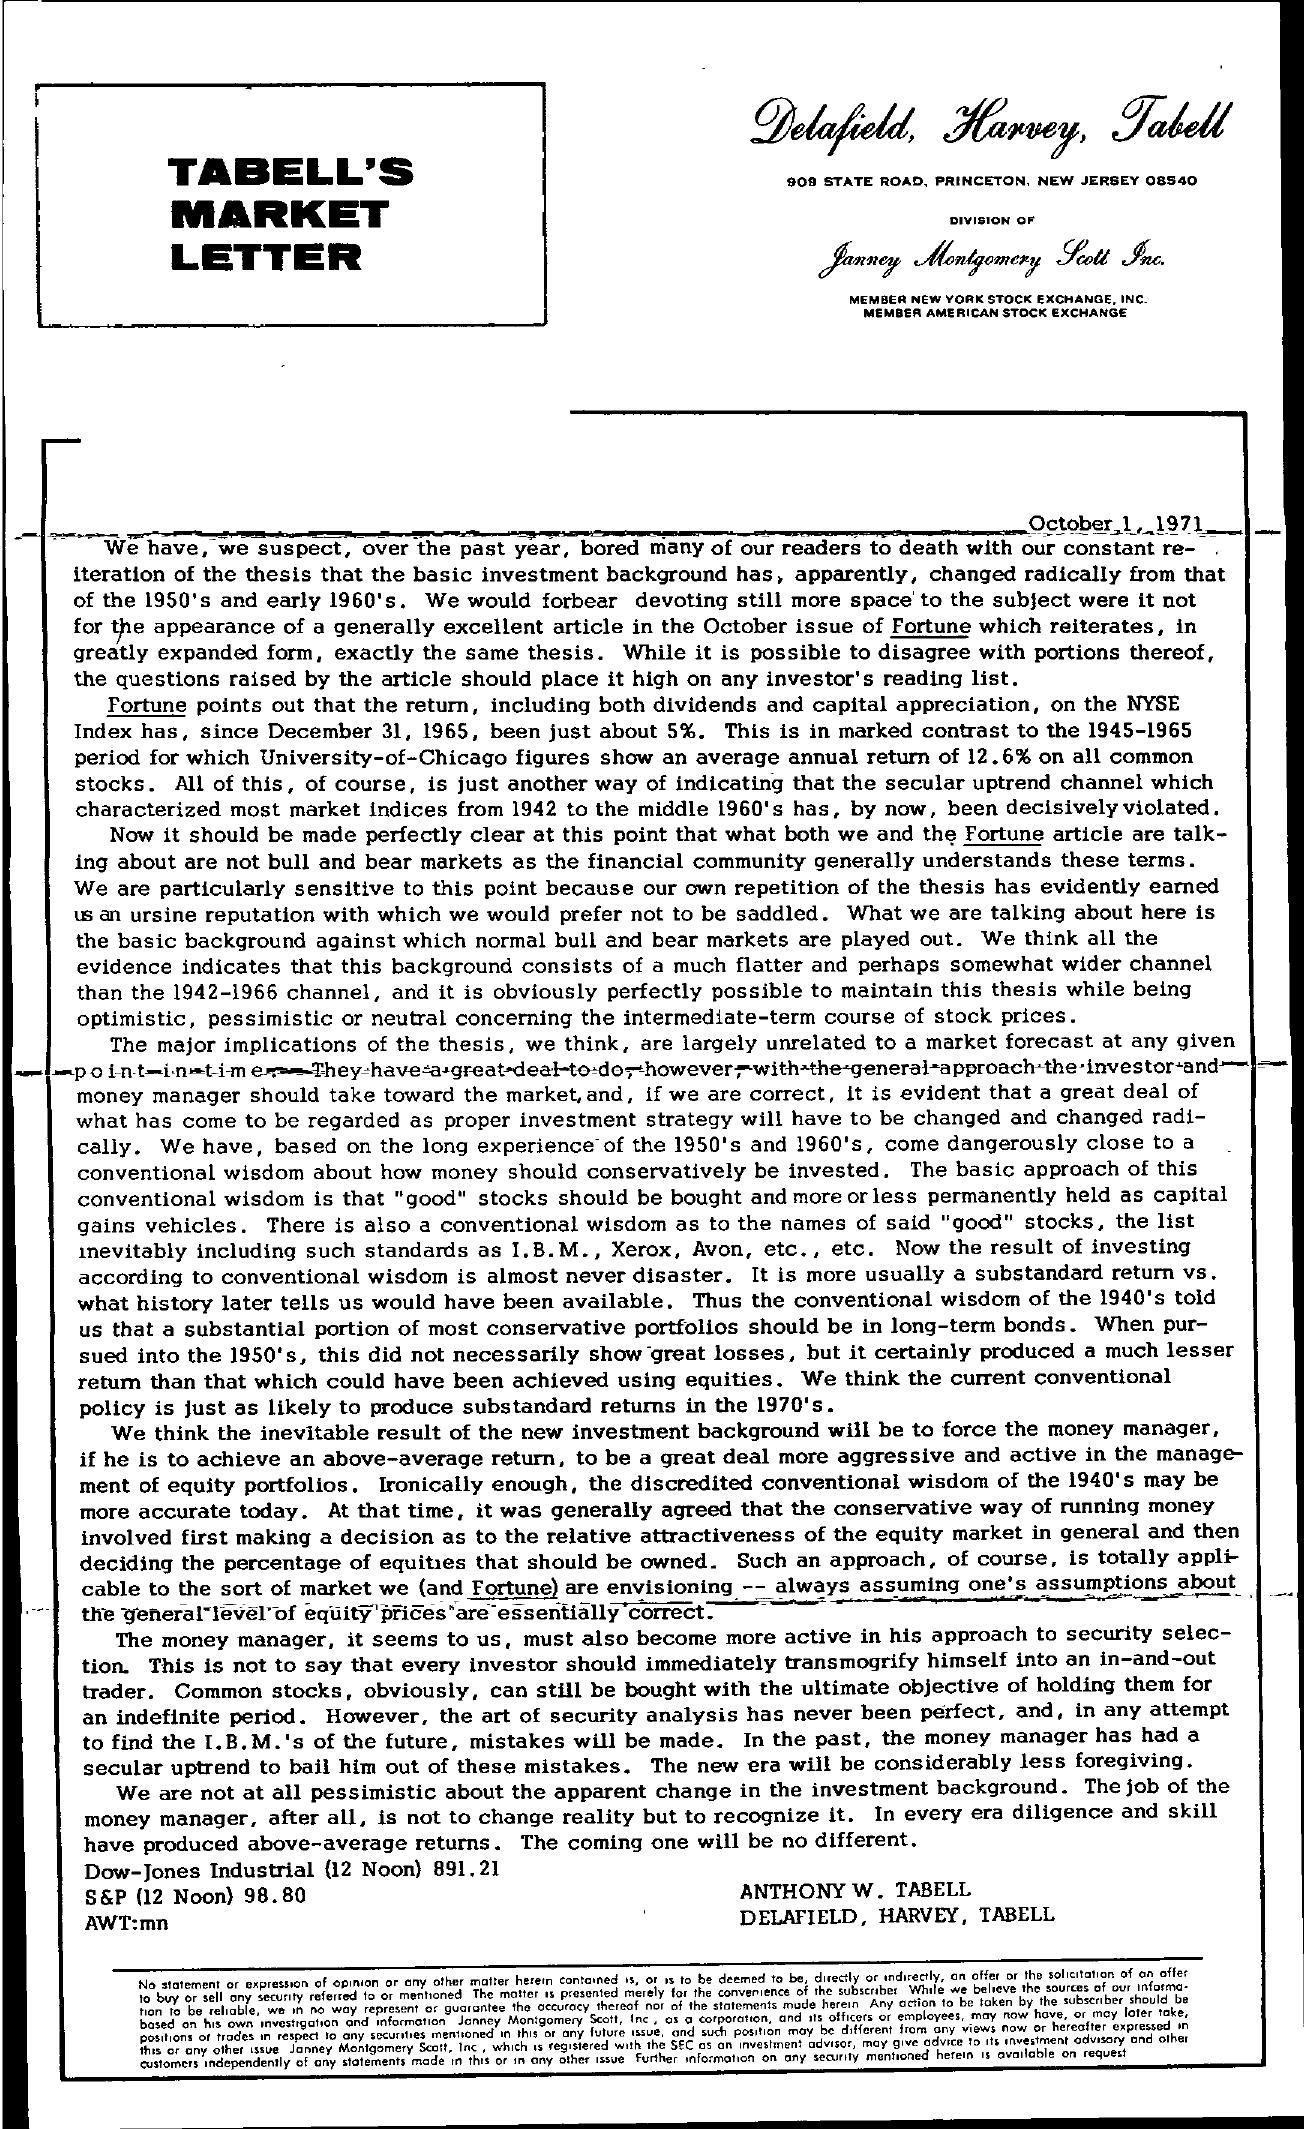 Tabell's Market Letter - October 01, 1971